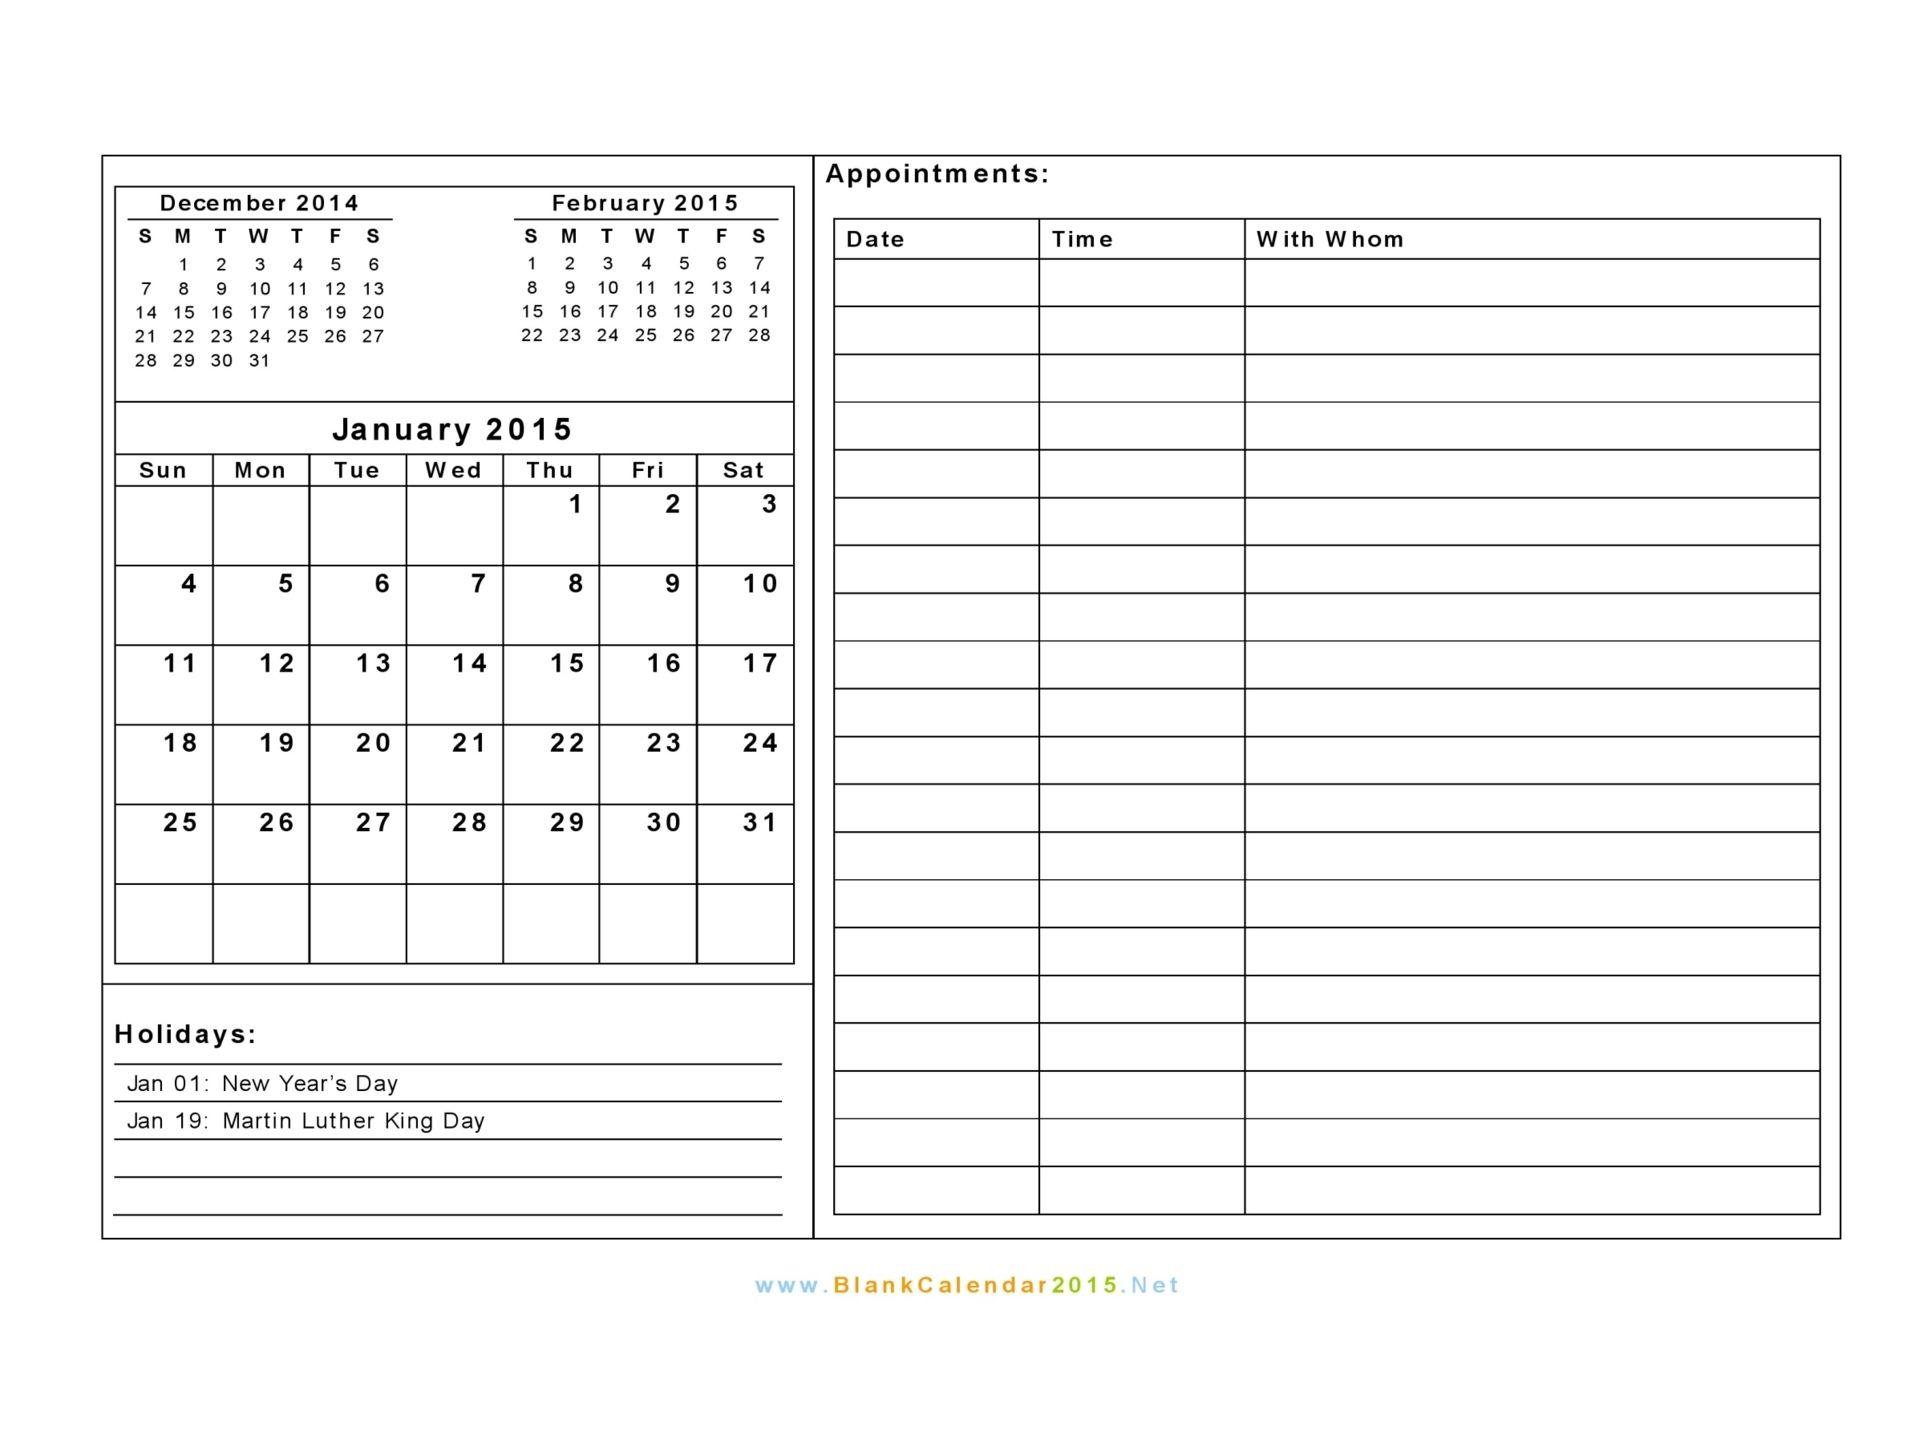 blank calendar 2015 3 months appointmentsjpg 1923